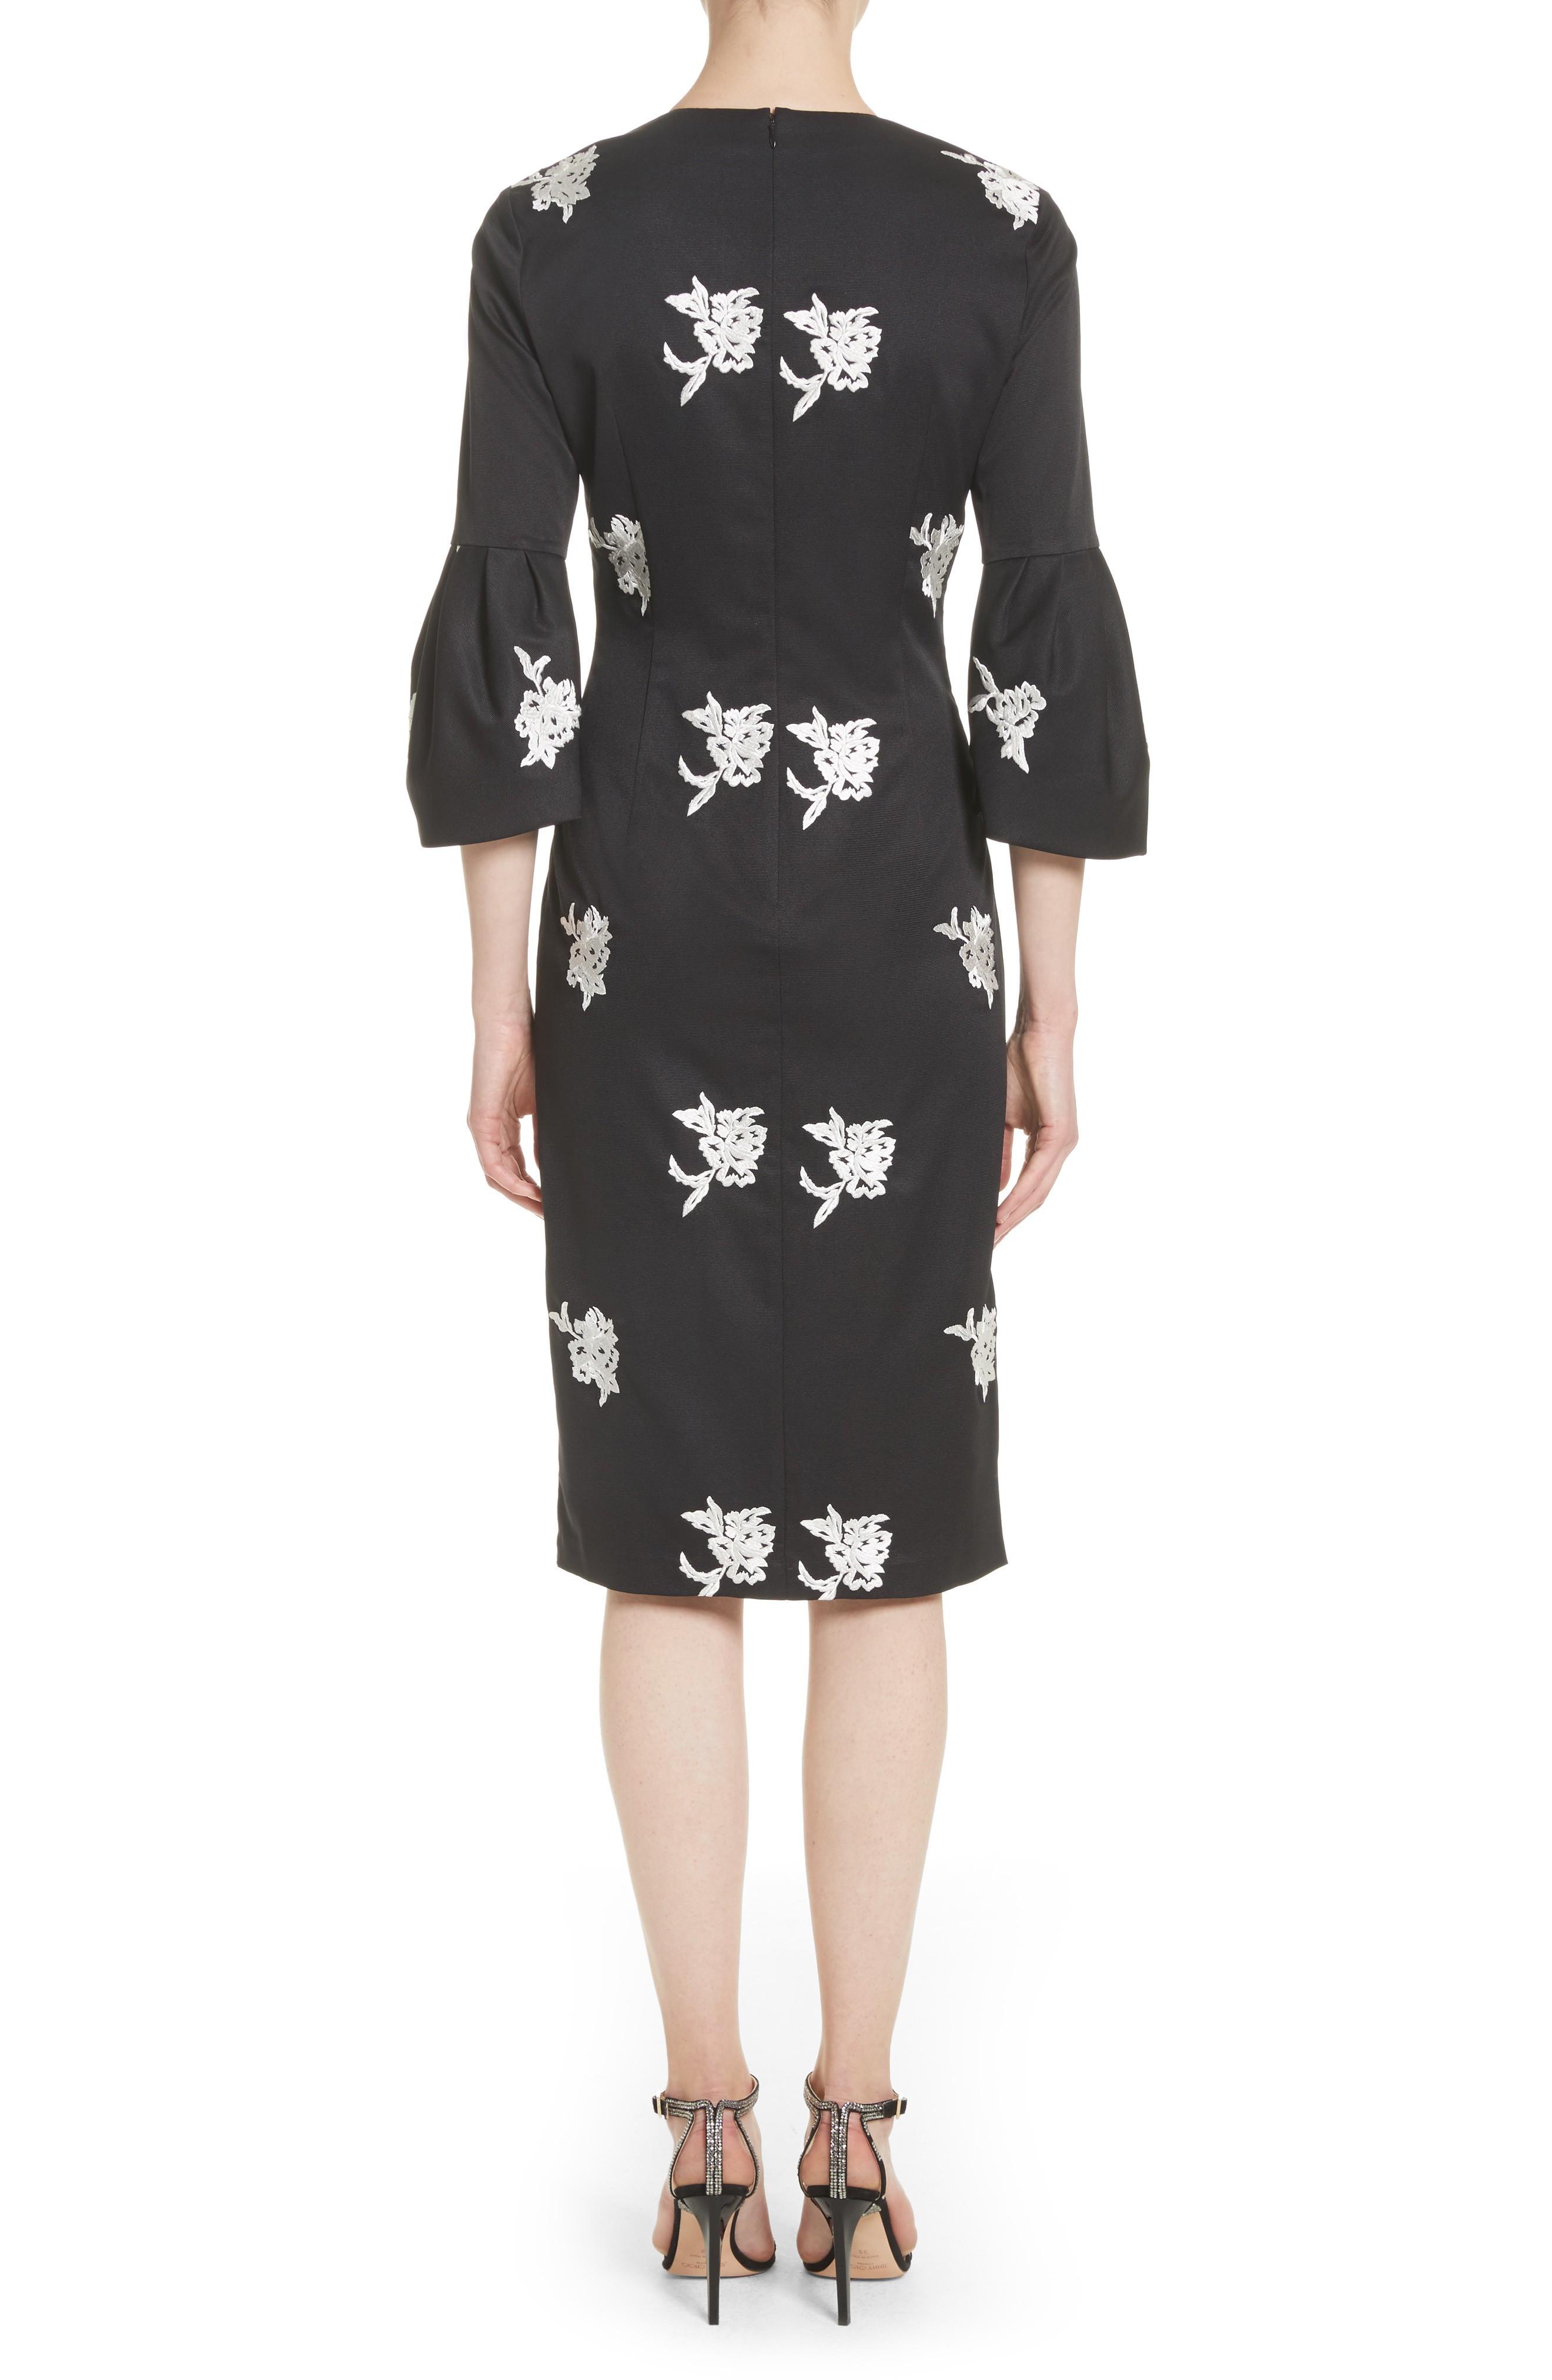 Sachin Babi Noir Embroidered Bell Sleeve Sheath Black Dress